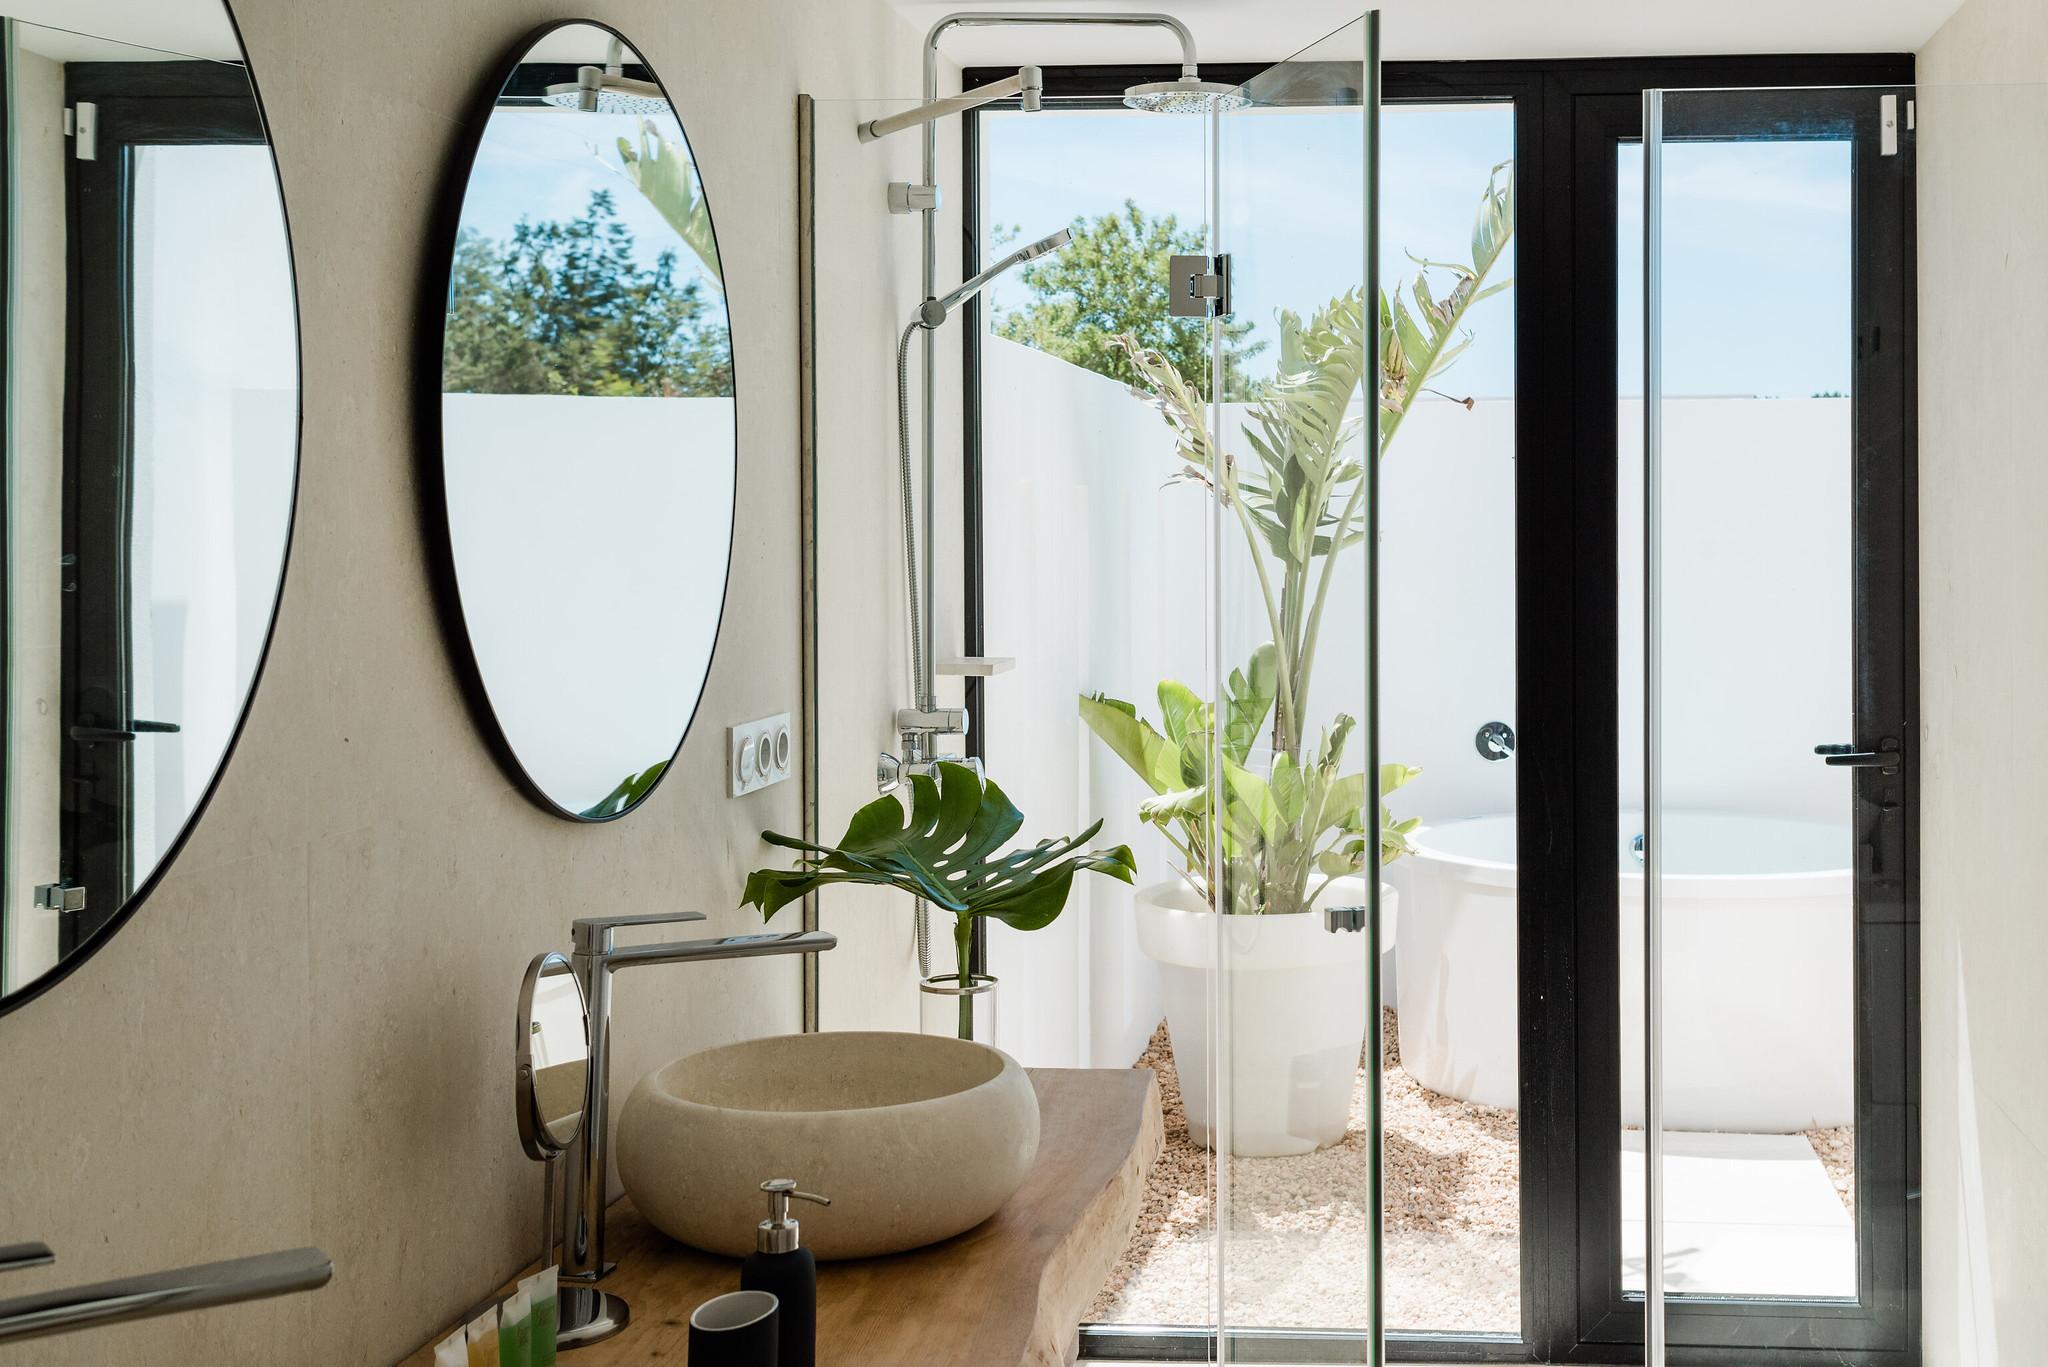 https://www.white-ibiza.com/wp-content/uploads/2020/06/white-ibiza-villas-can-carmen-interior-bathroom4.jpg